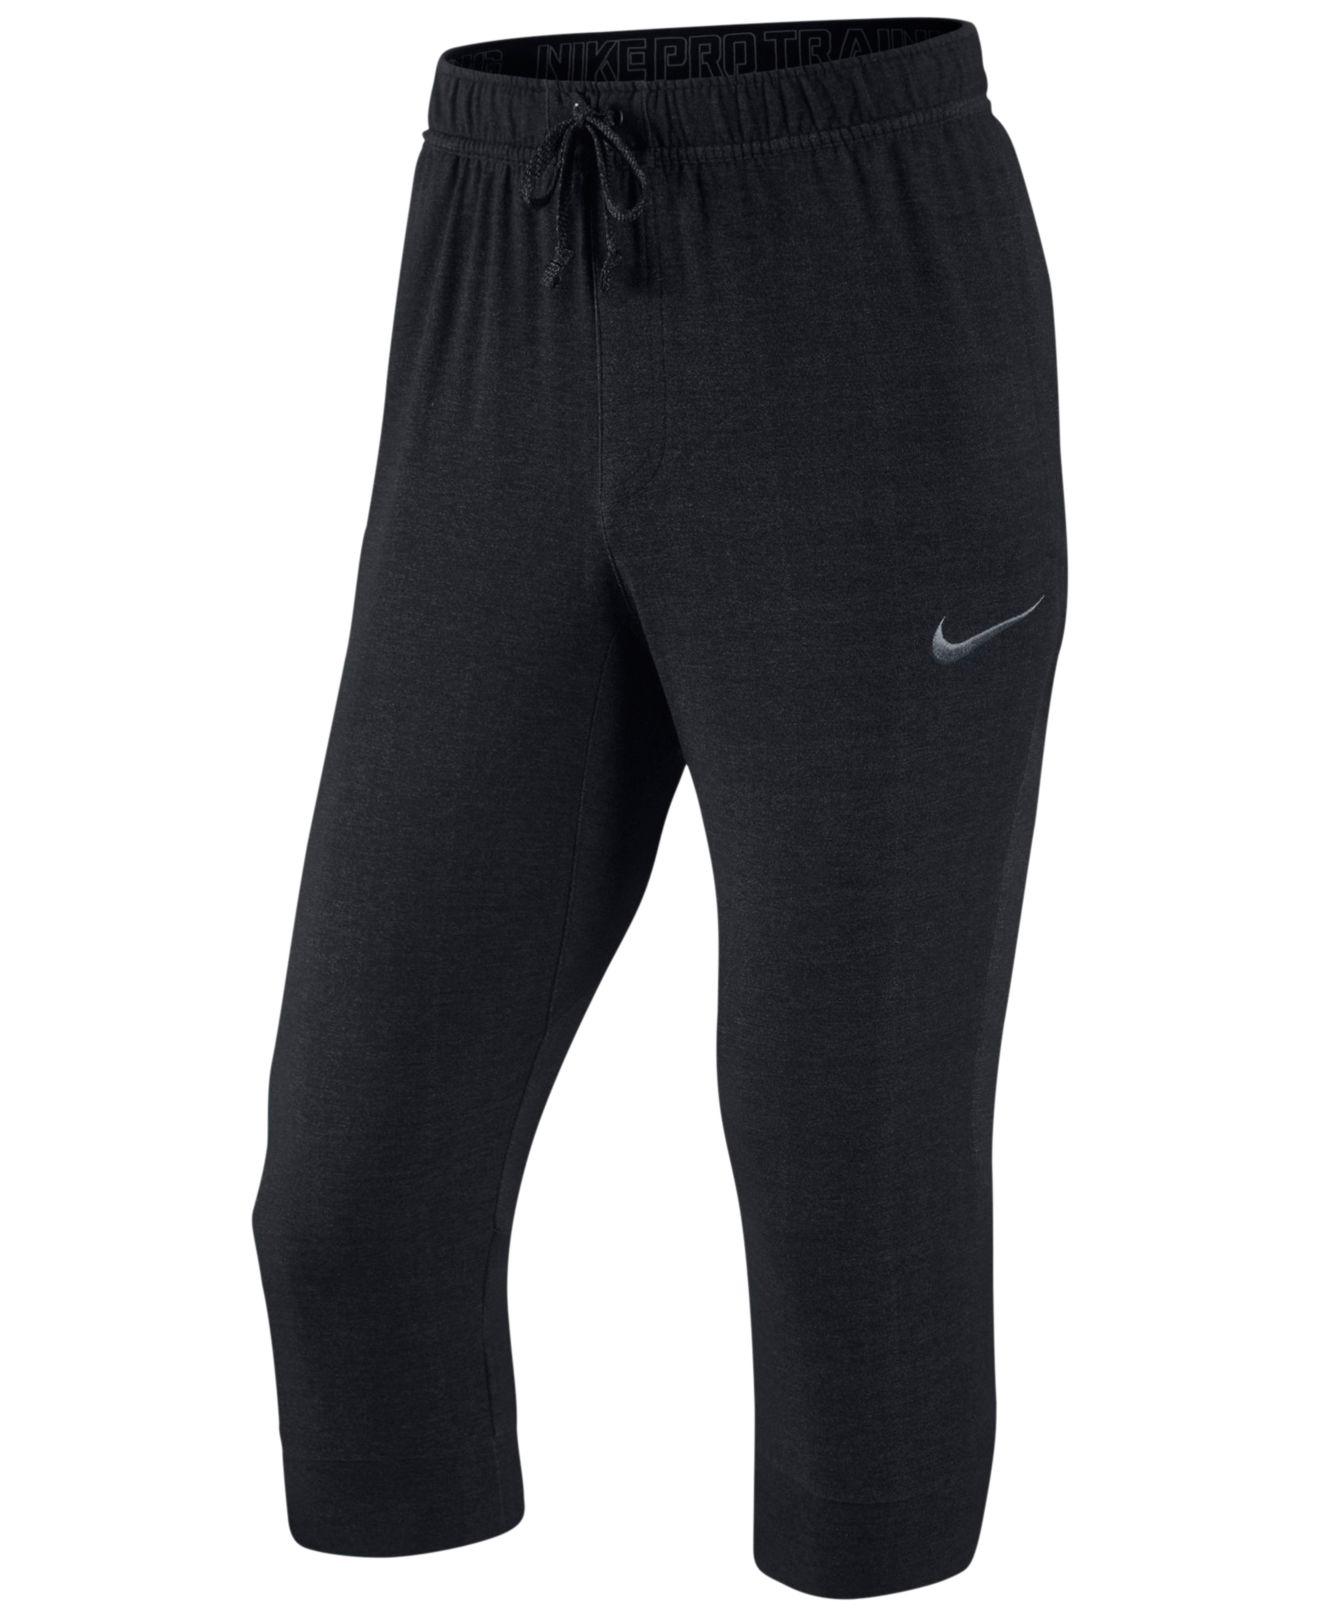 3d8c70372721 Lyst - Nike Men s Touch Dri-fit Fleece 3 4 Length Pants in Black for Men